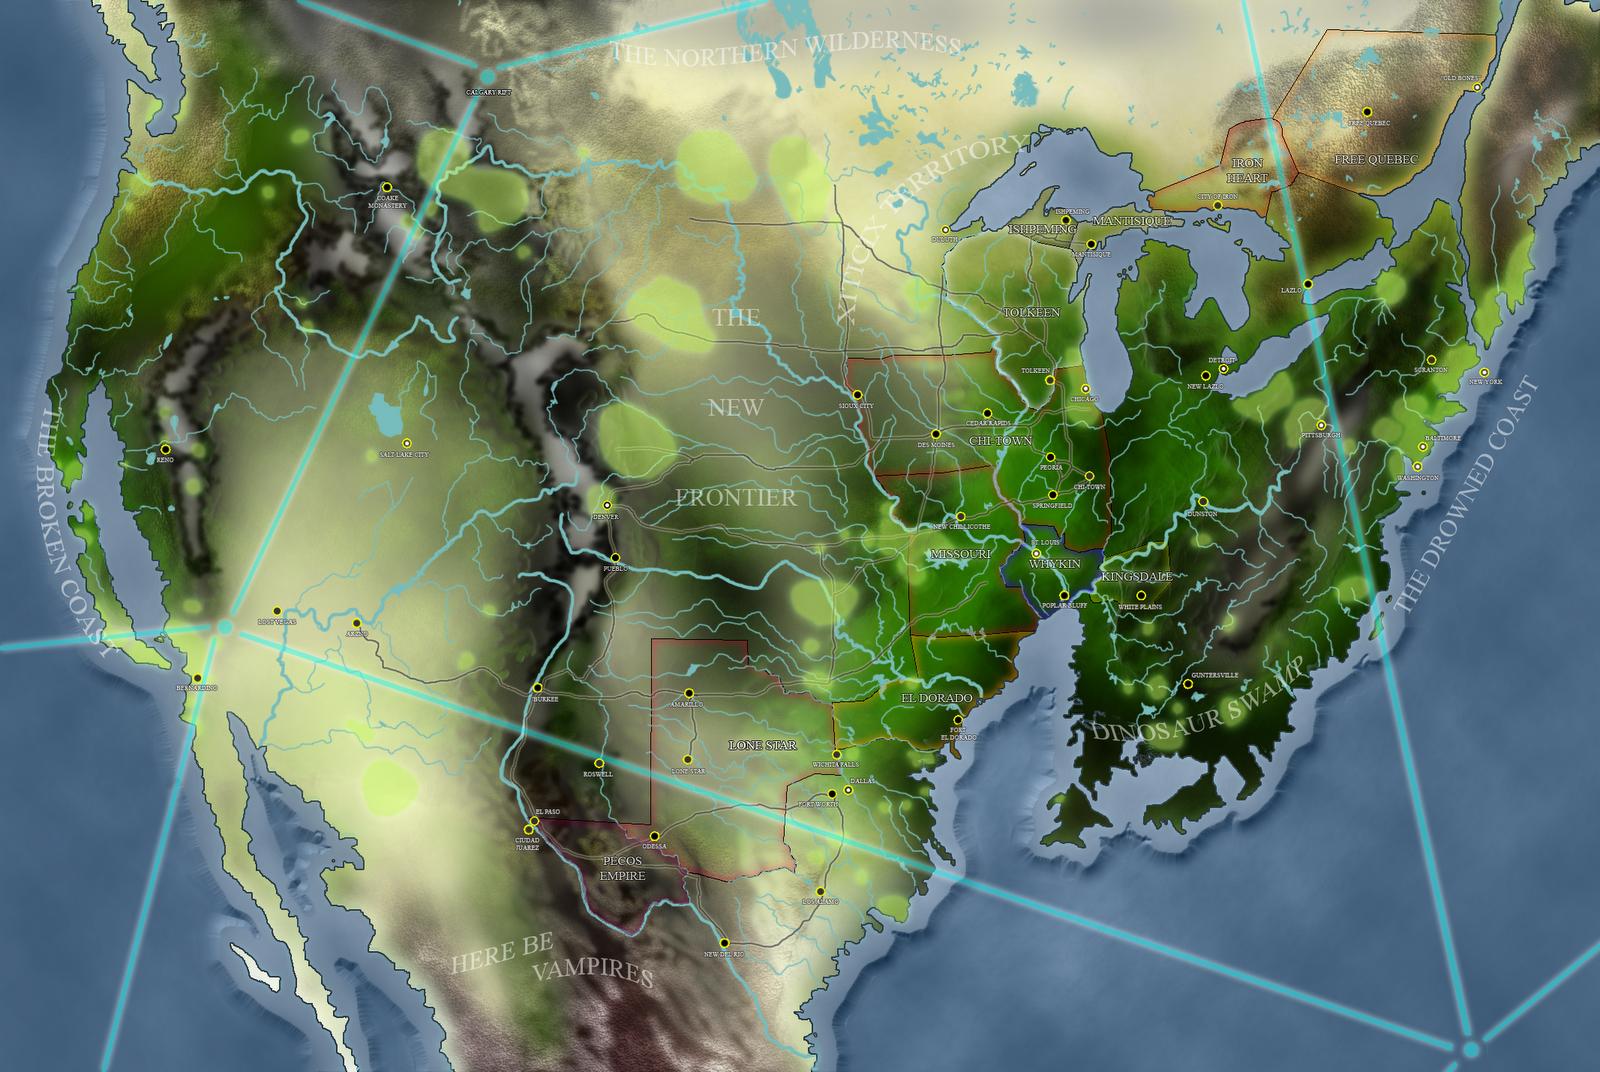 North America Map City And States%0A Palladium Rifts map